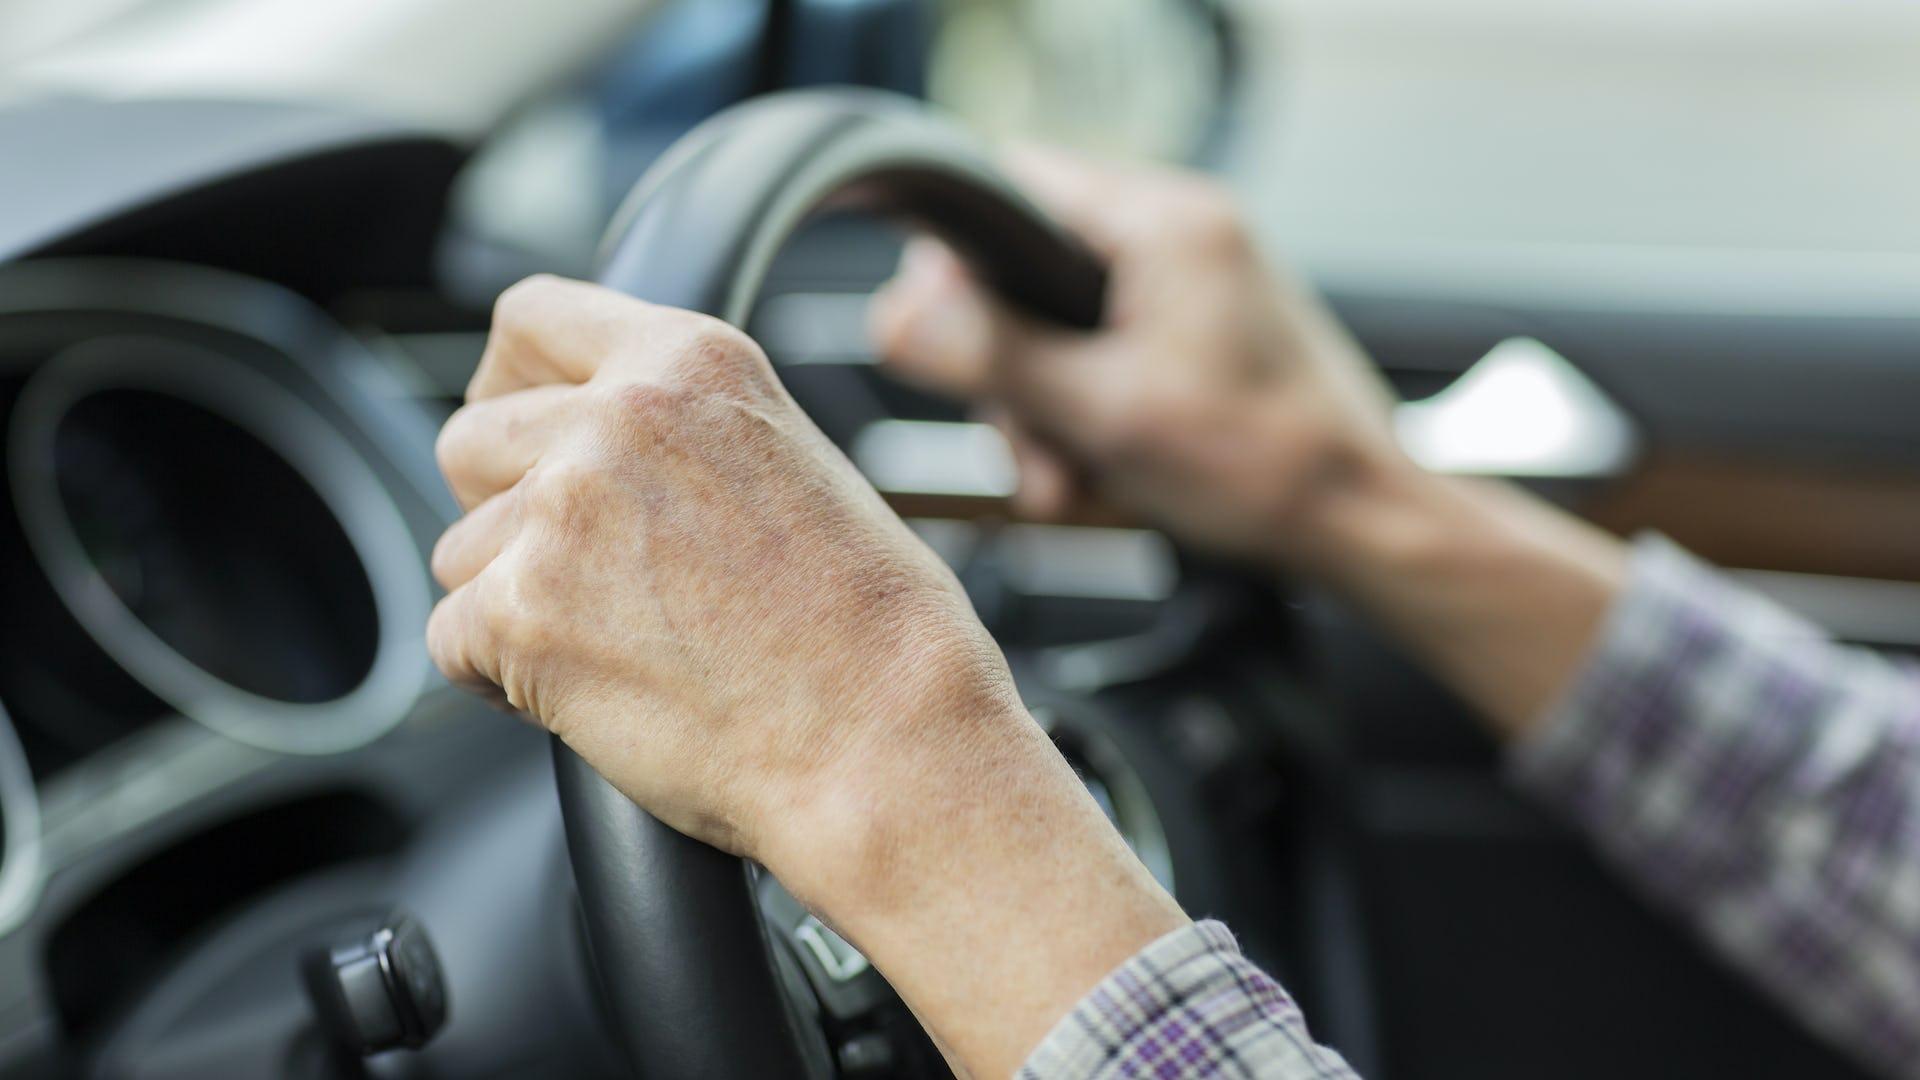 Elderly hands on a steering wheel